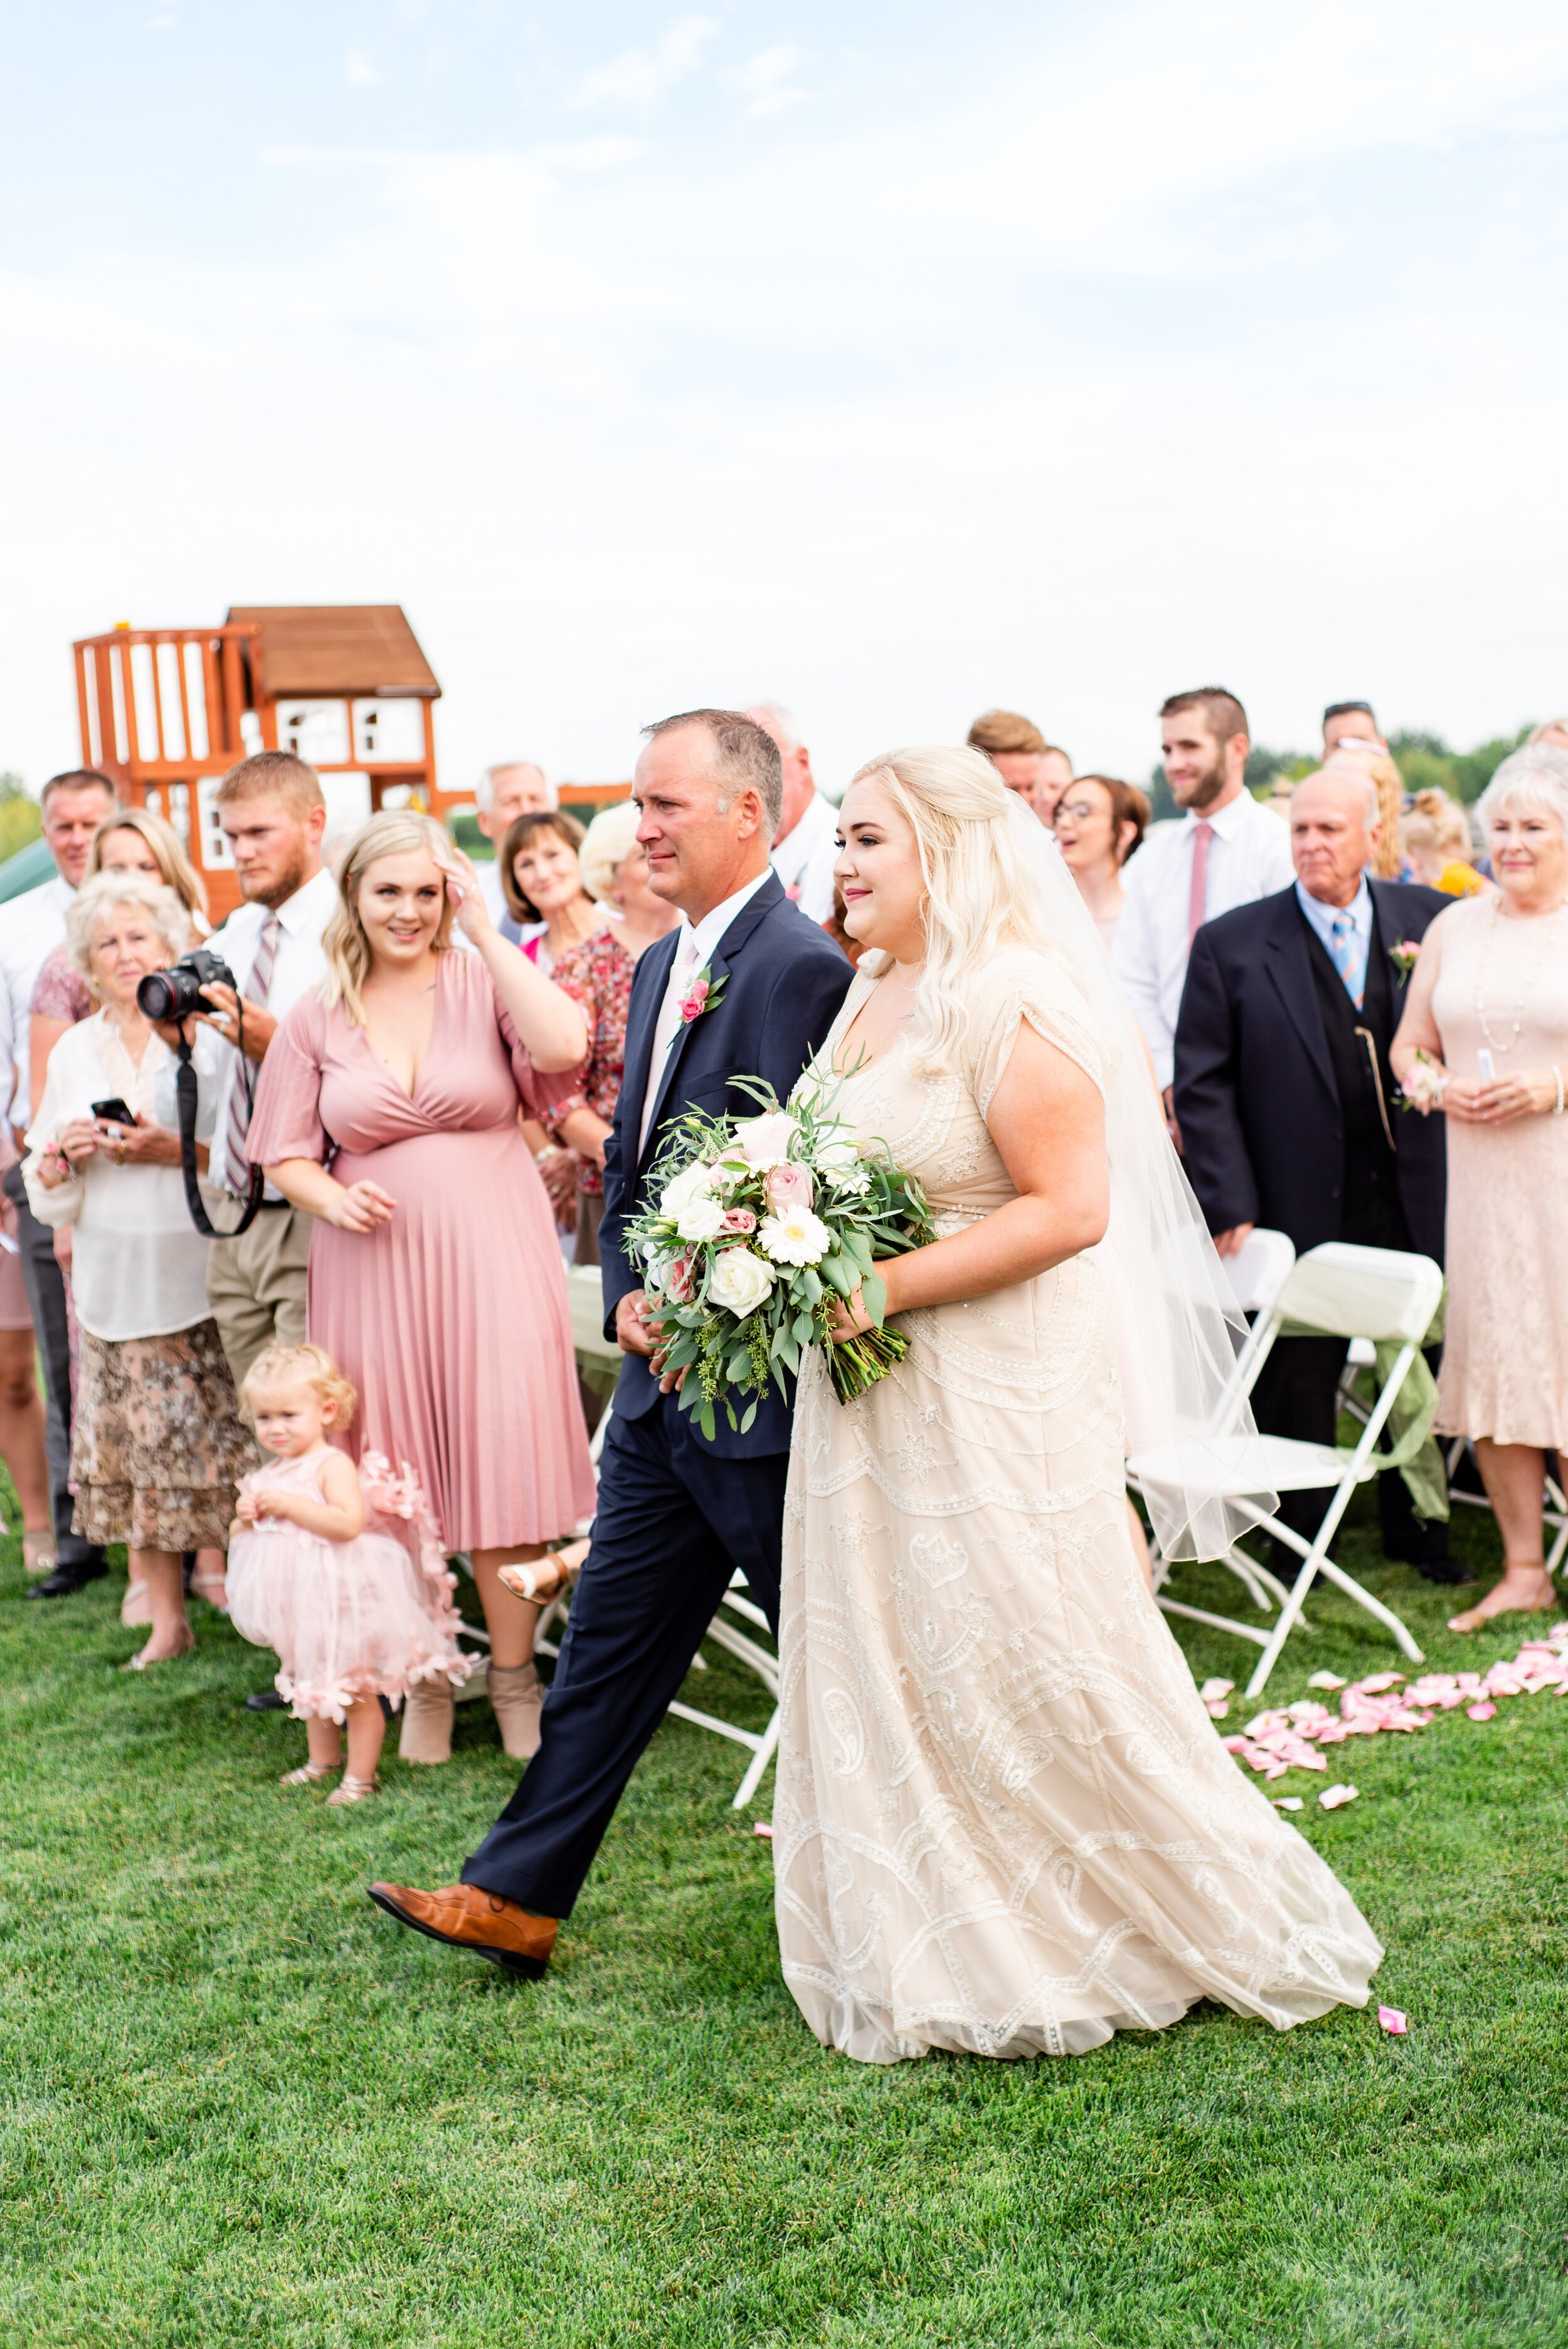 Dad Walking Bride Up Aisle - Tri Cities Wedding Photographer - Morgan Tayler Photo & Design - Tri Cities Washington Backyard Wedding